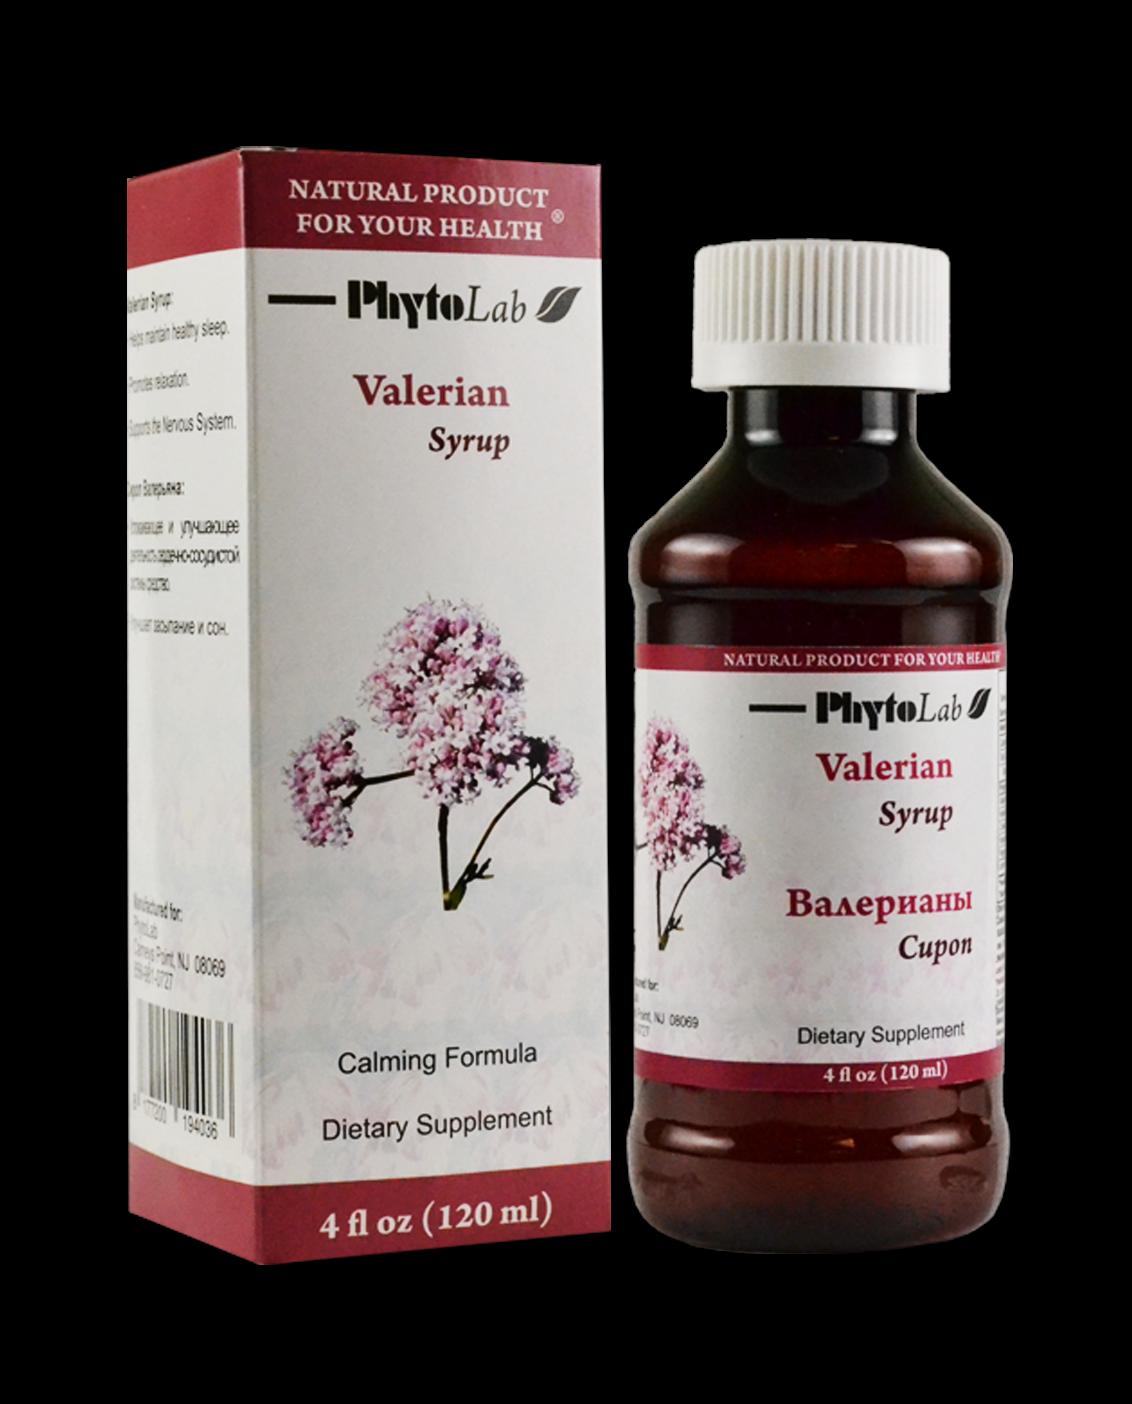 Valerian Syrup Herbal Syrups